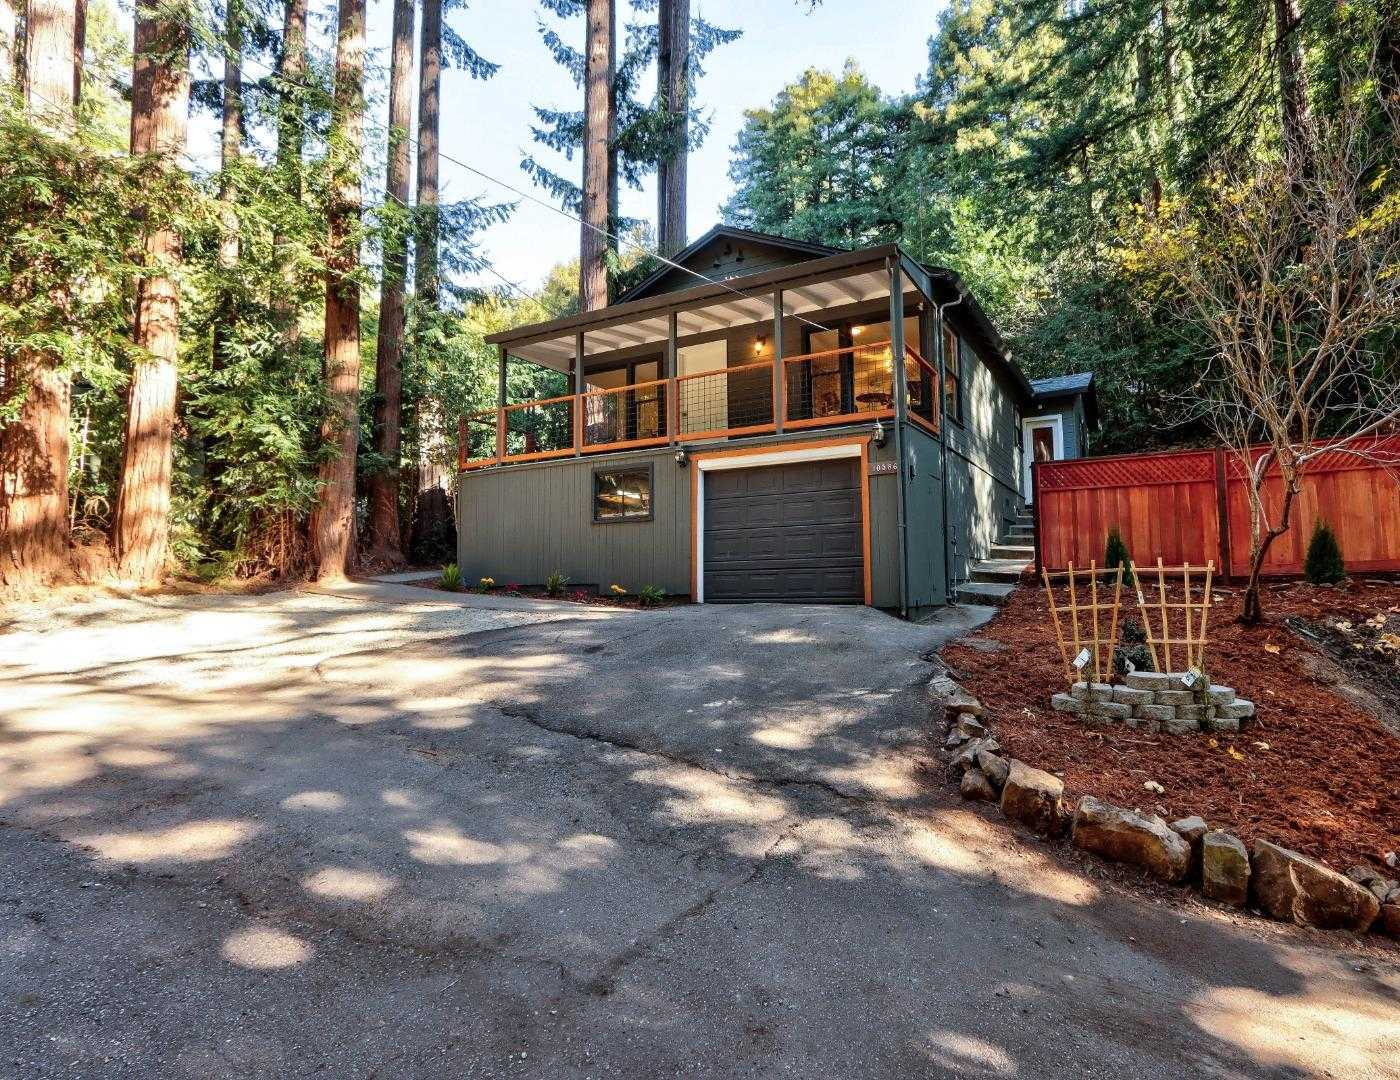 10586 Creekwood DR FELTON, CA 95018